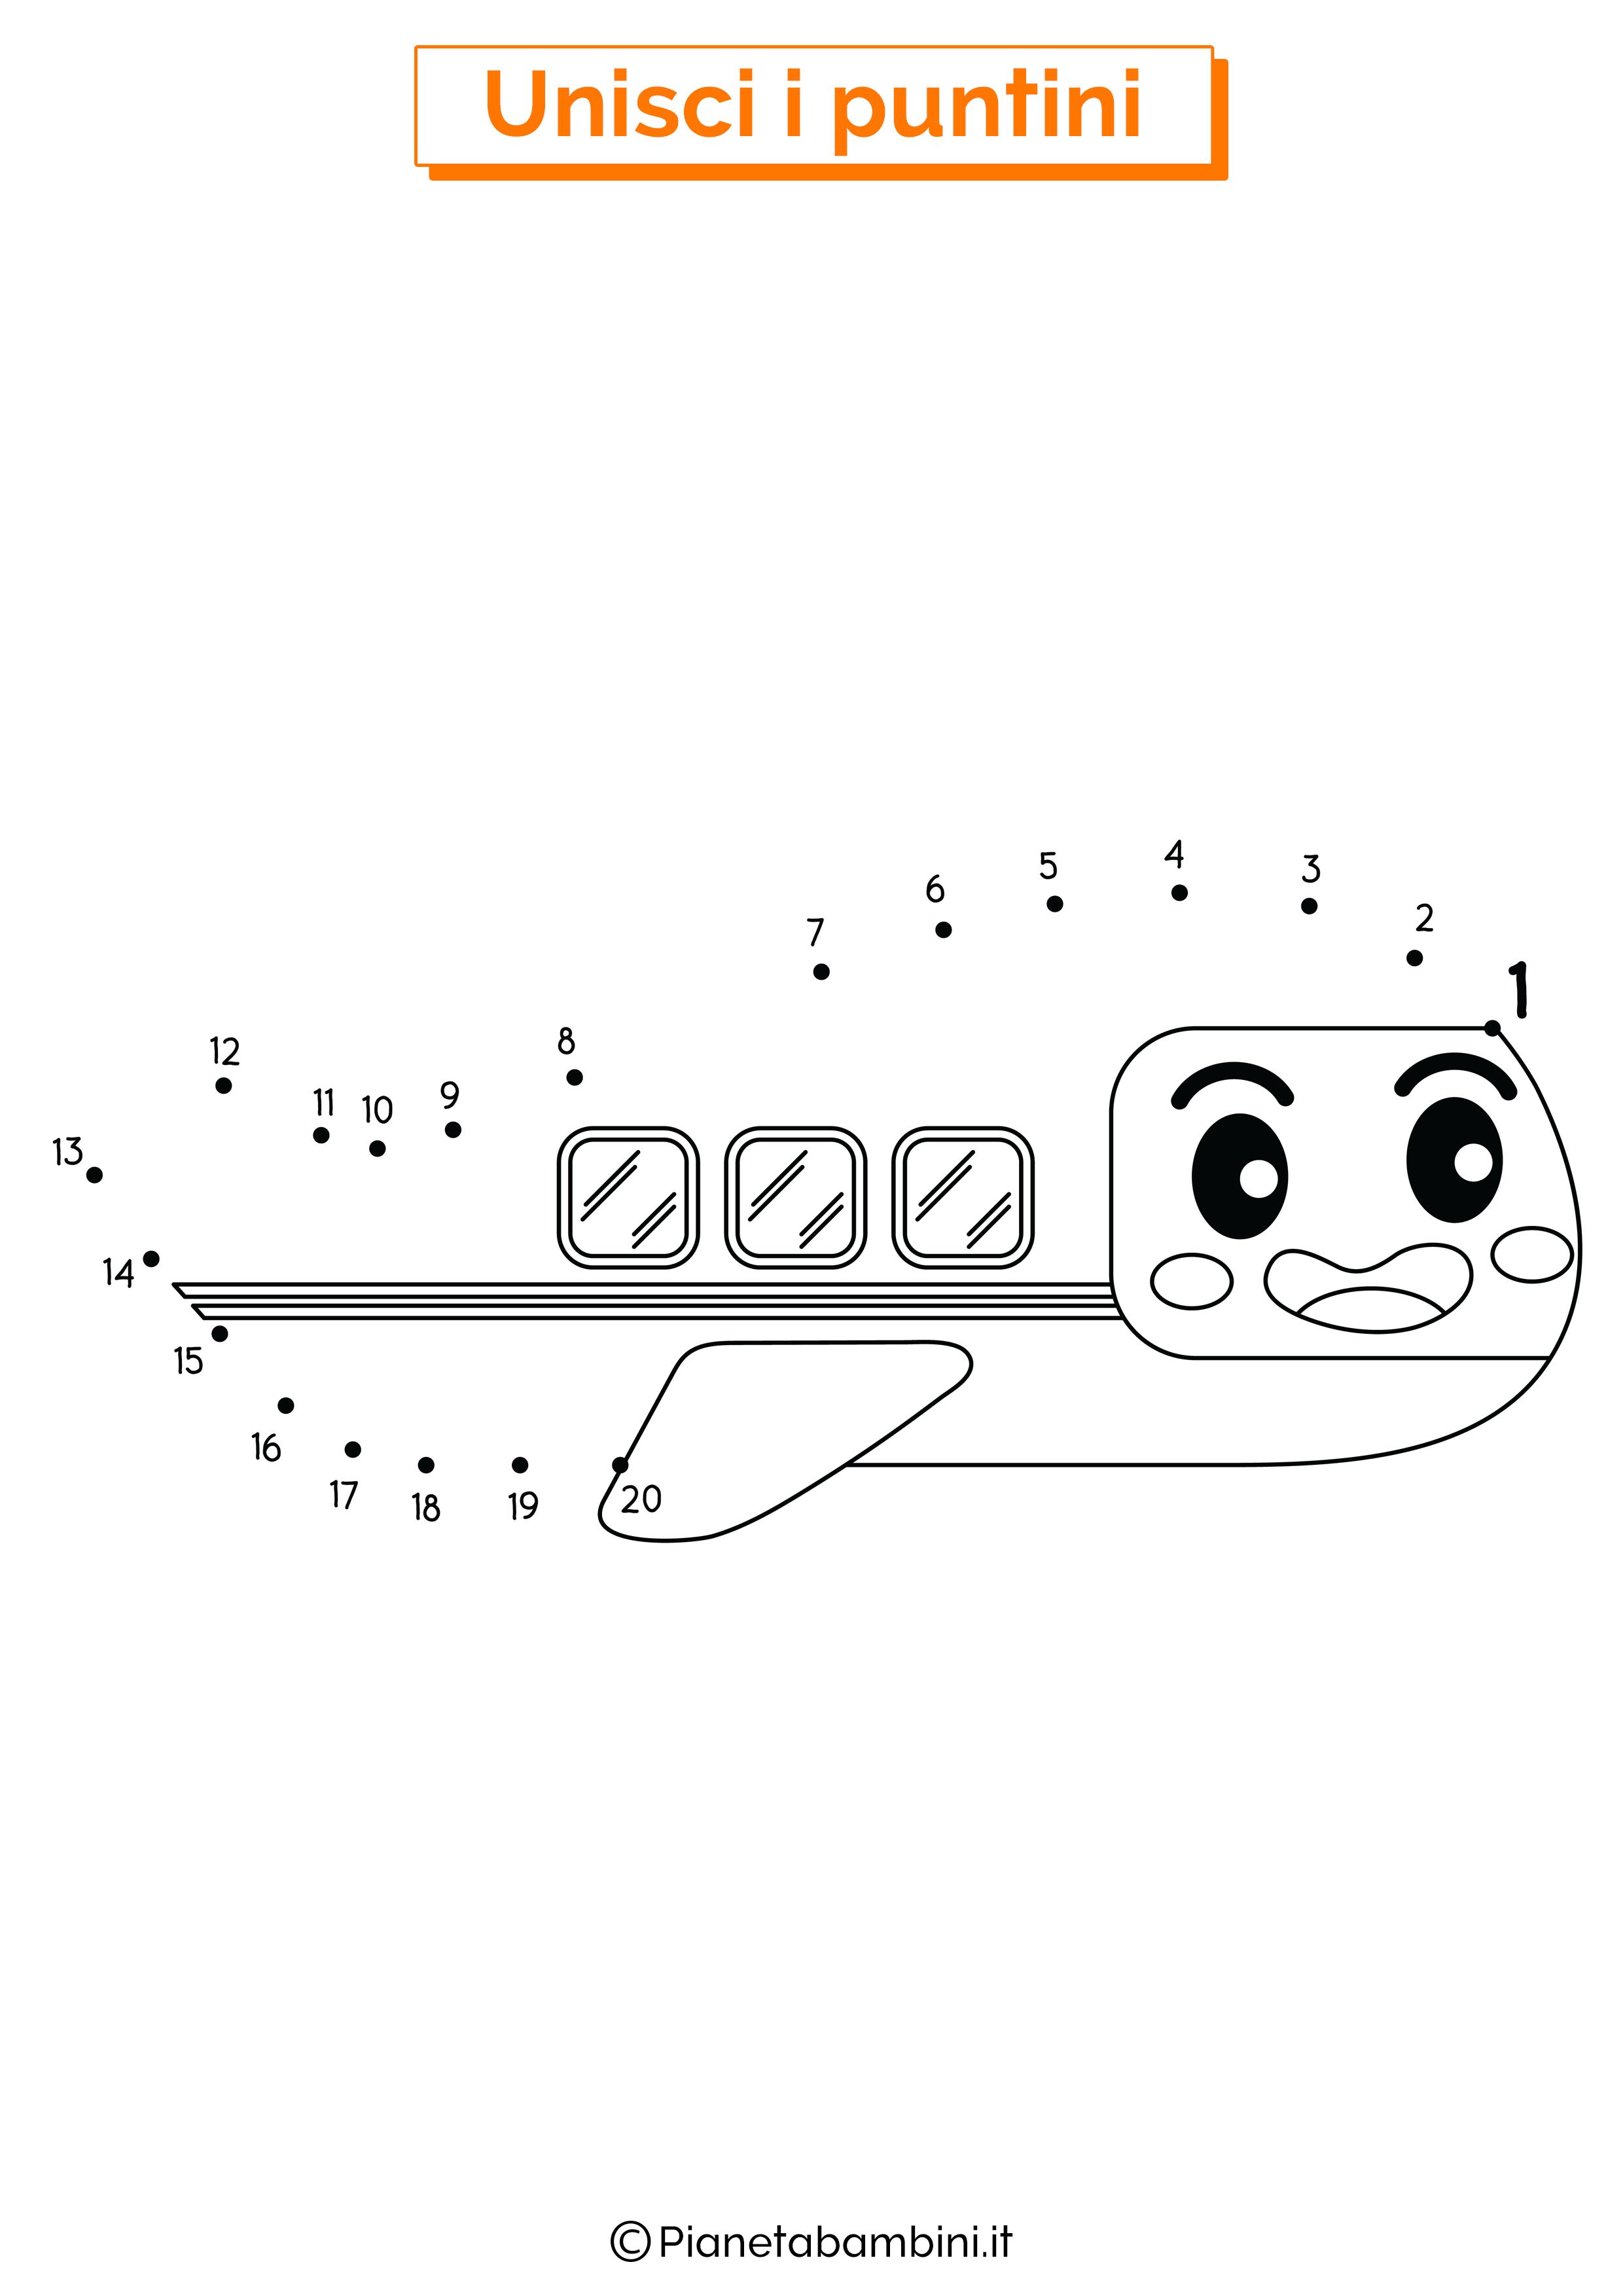 Disegno unisci i puntini aereo